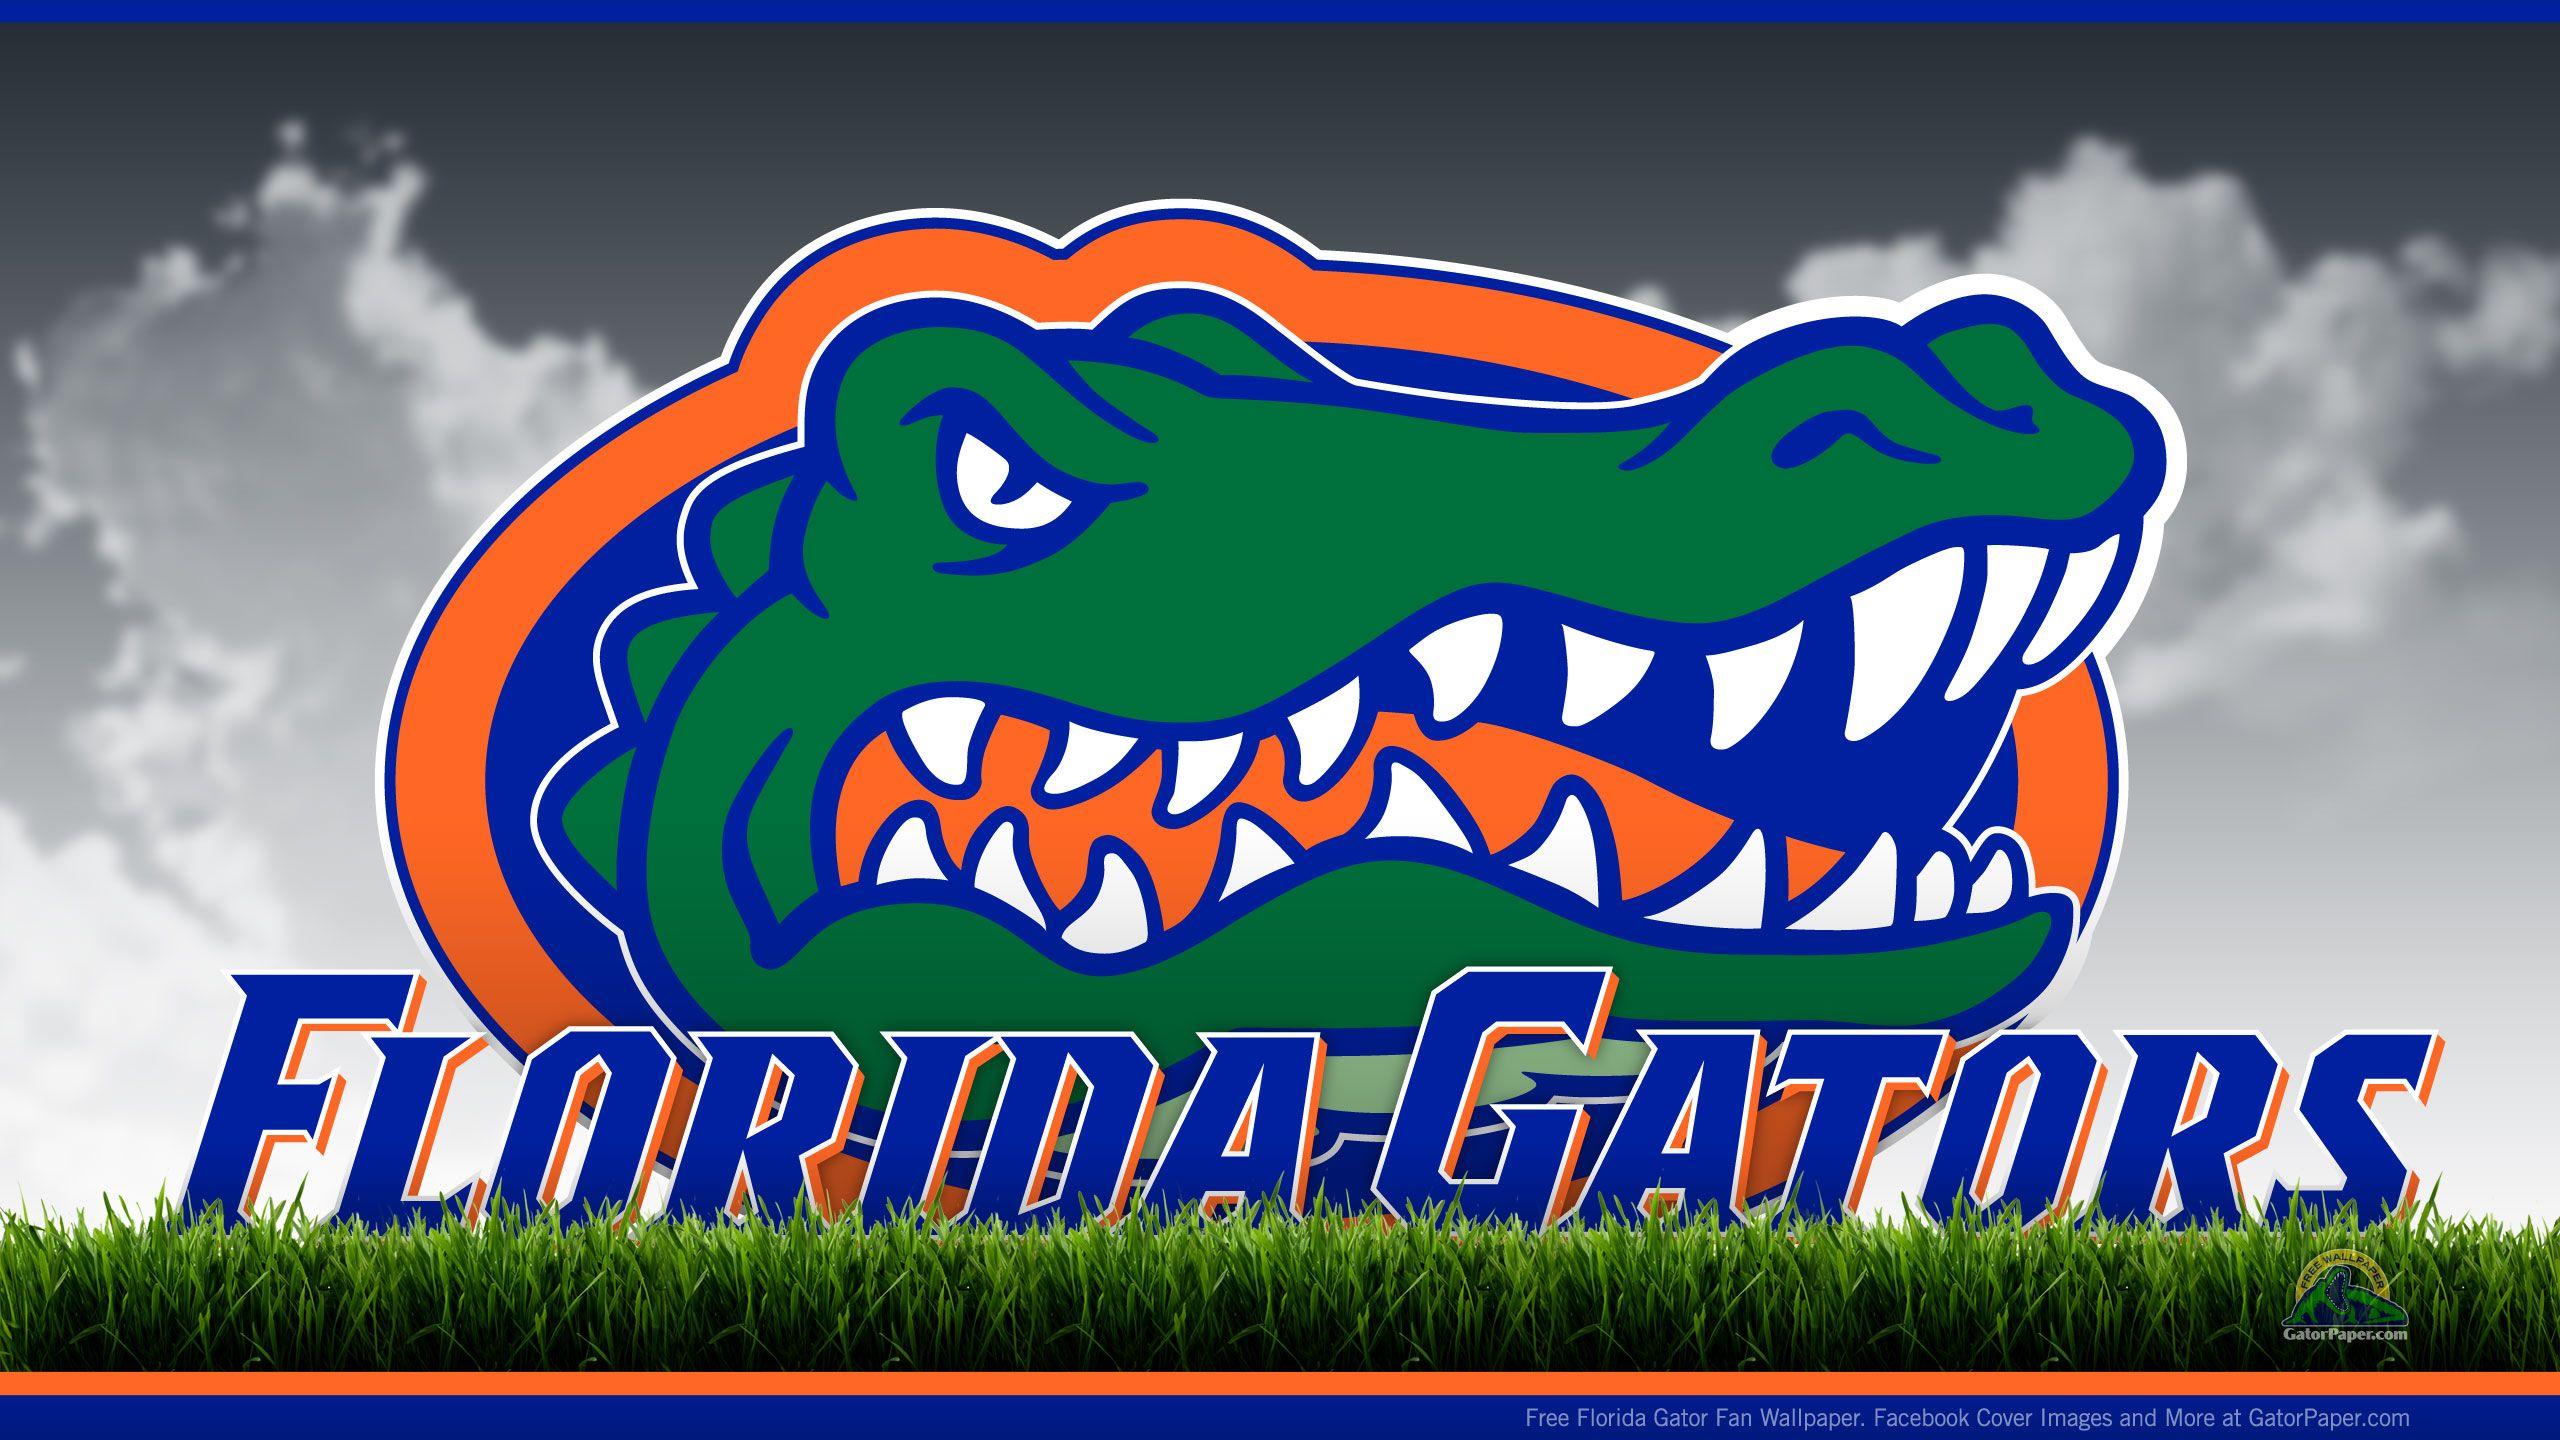 Image For Florida Gators Football Wallpaper Florida Gators Football Florida Gators Wallpaper Florida Gators